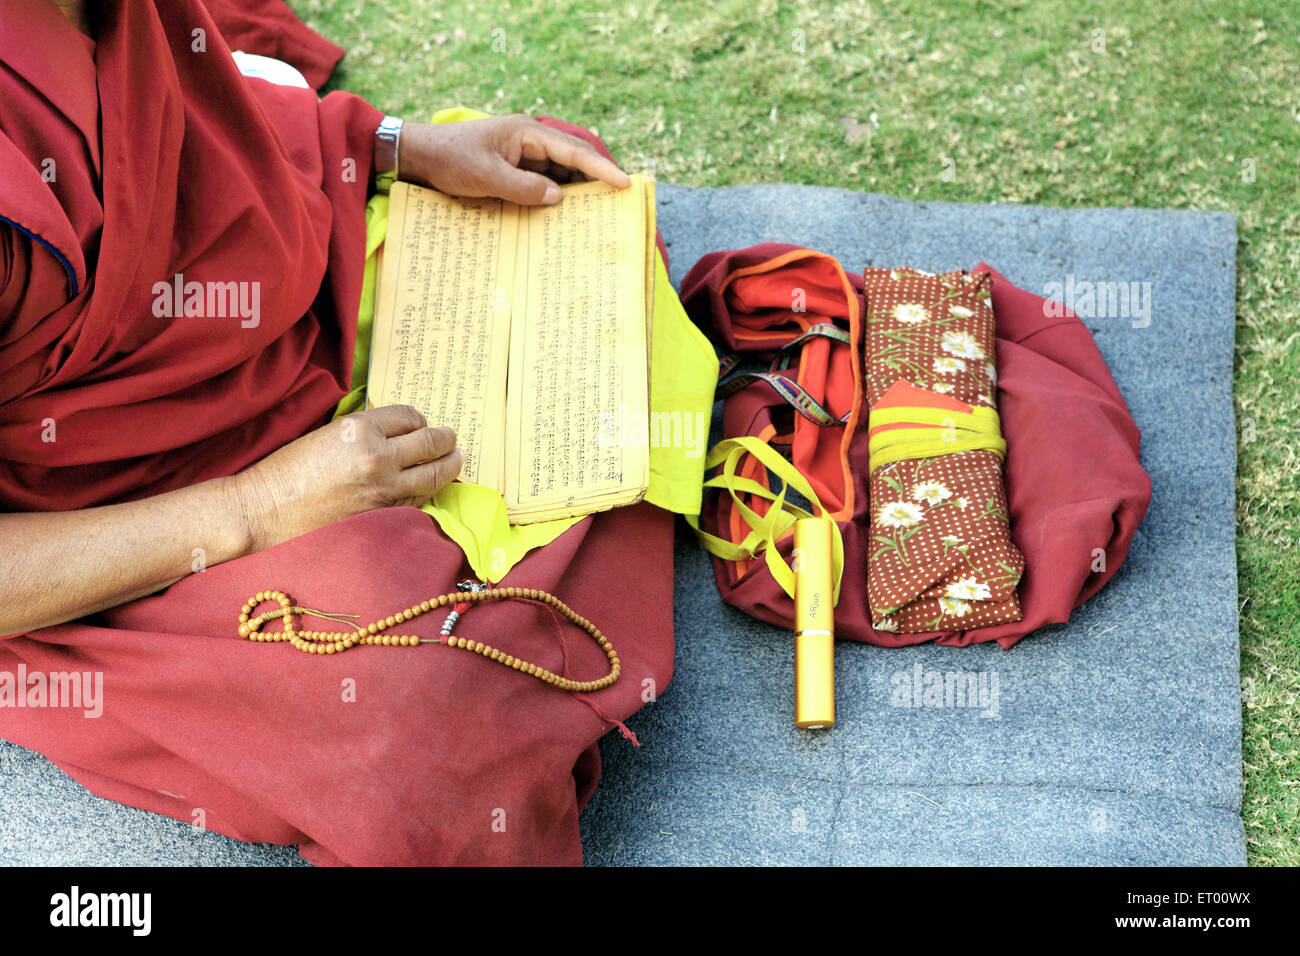 Buddhist monk reading scriptures ; Sanchi ; Madhya Pradesh ; India - Stock Image